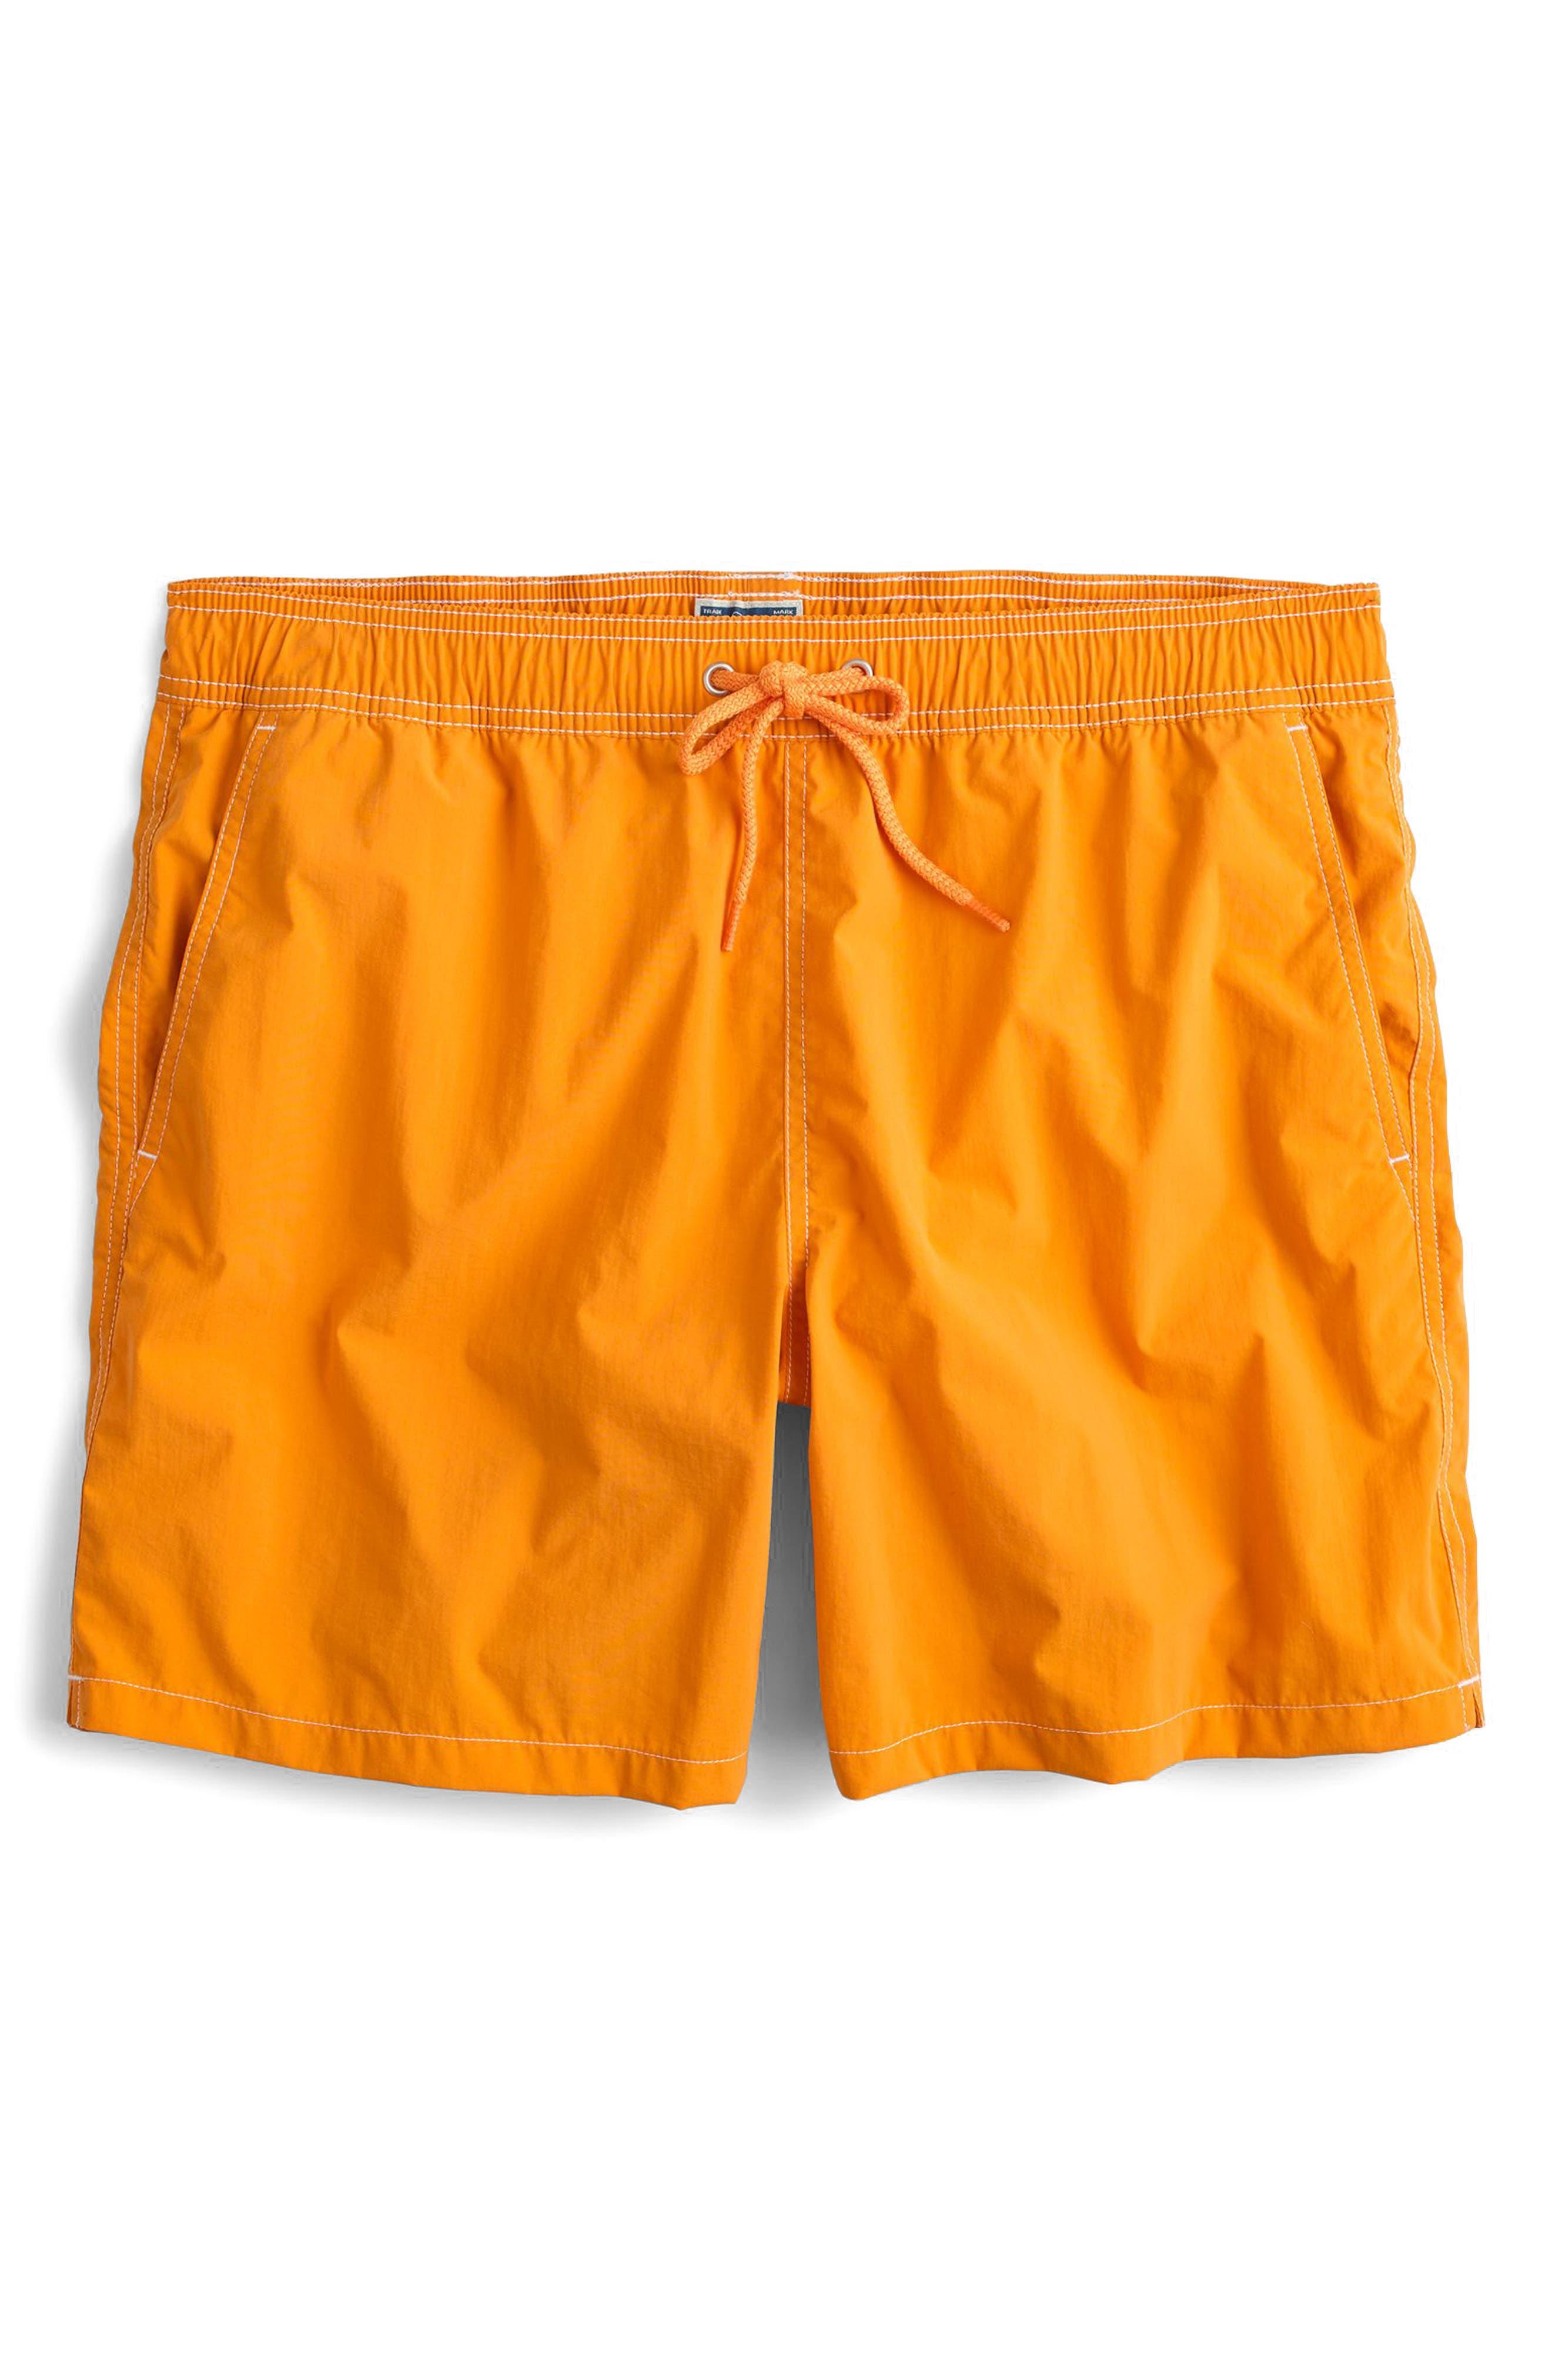 Solid Swim Trunks,                         Main,                         color, Golden Sunset